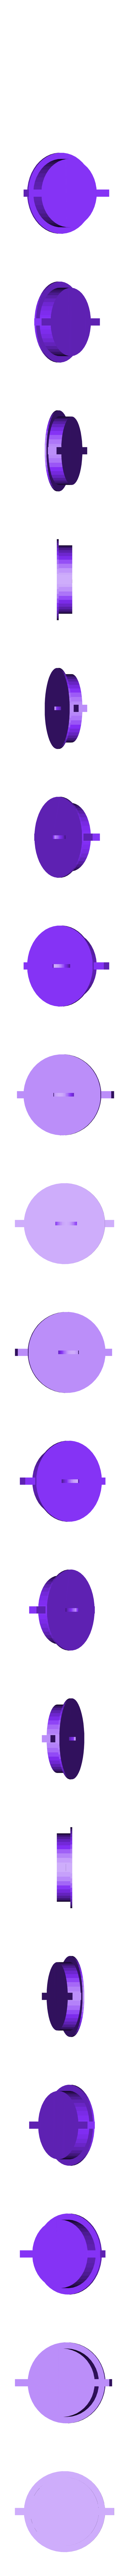 Snoopy_house_plug_v1.stl Download free STL file Snoopy vs Red Baron Bank (Compilation/remix) • 3D print template, lowboydrvr